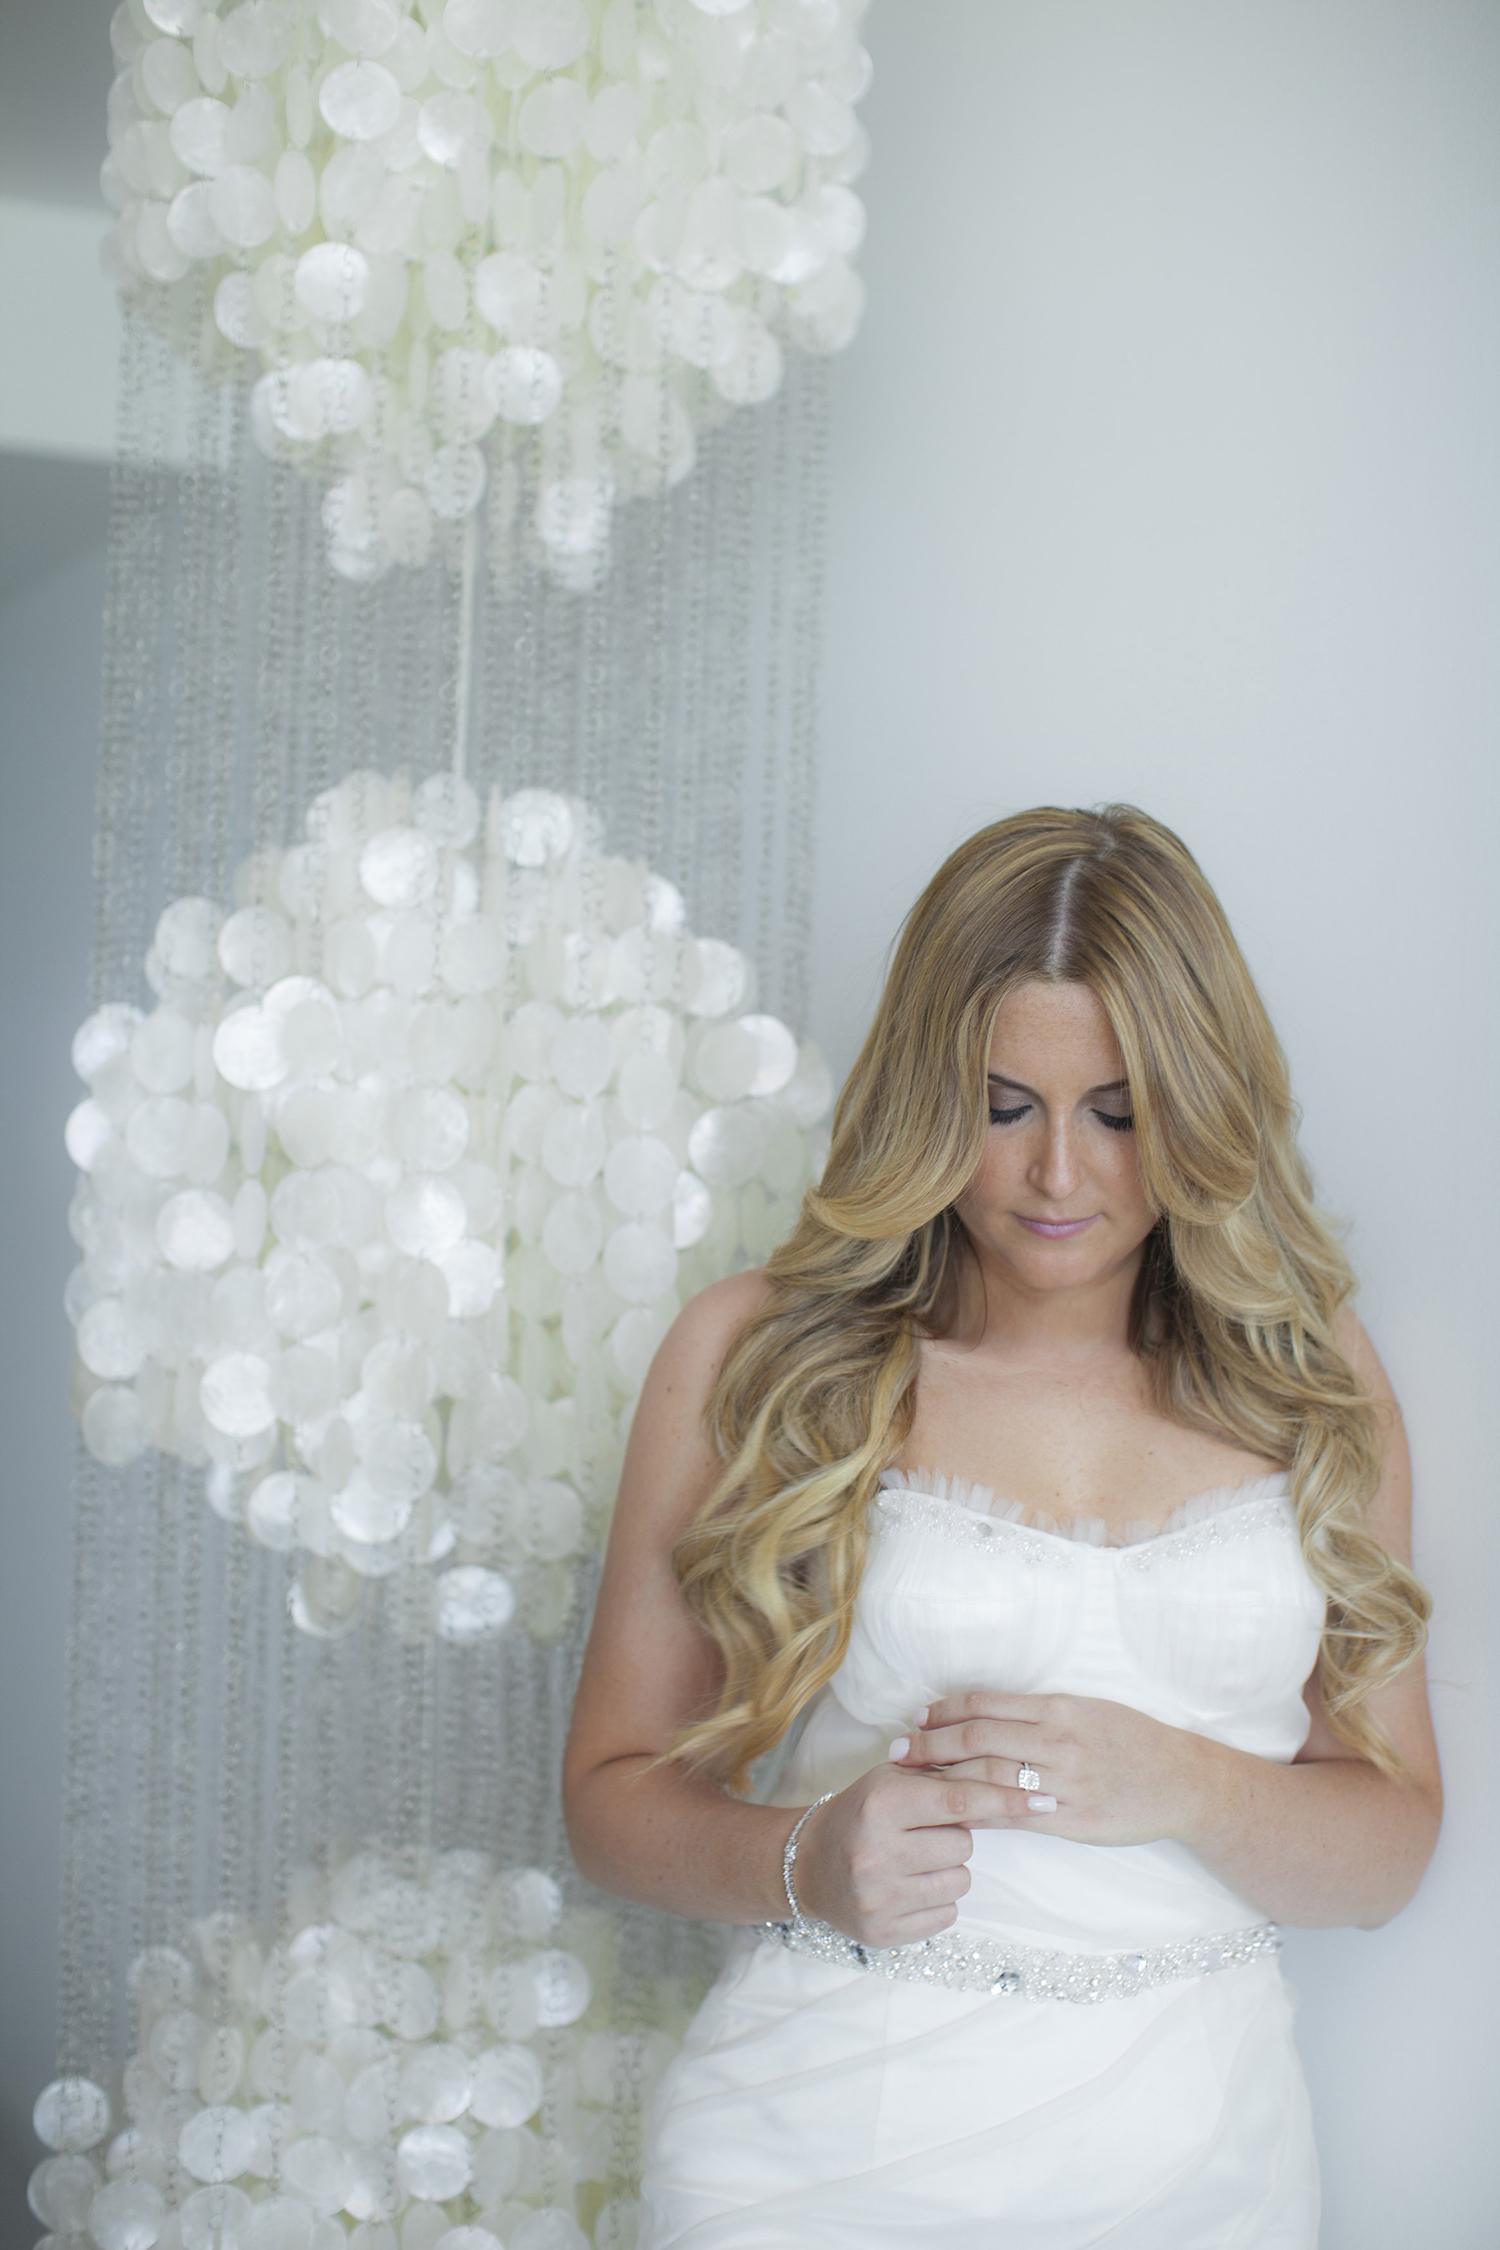 chris-weinberg-events-luxury-miami-wedding-planner-w-south-beach ...